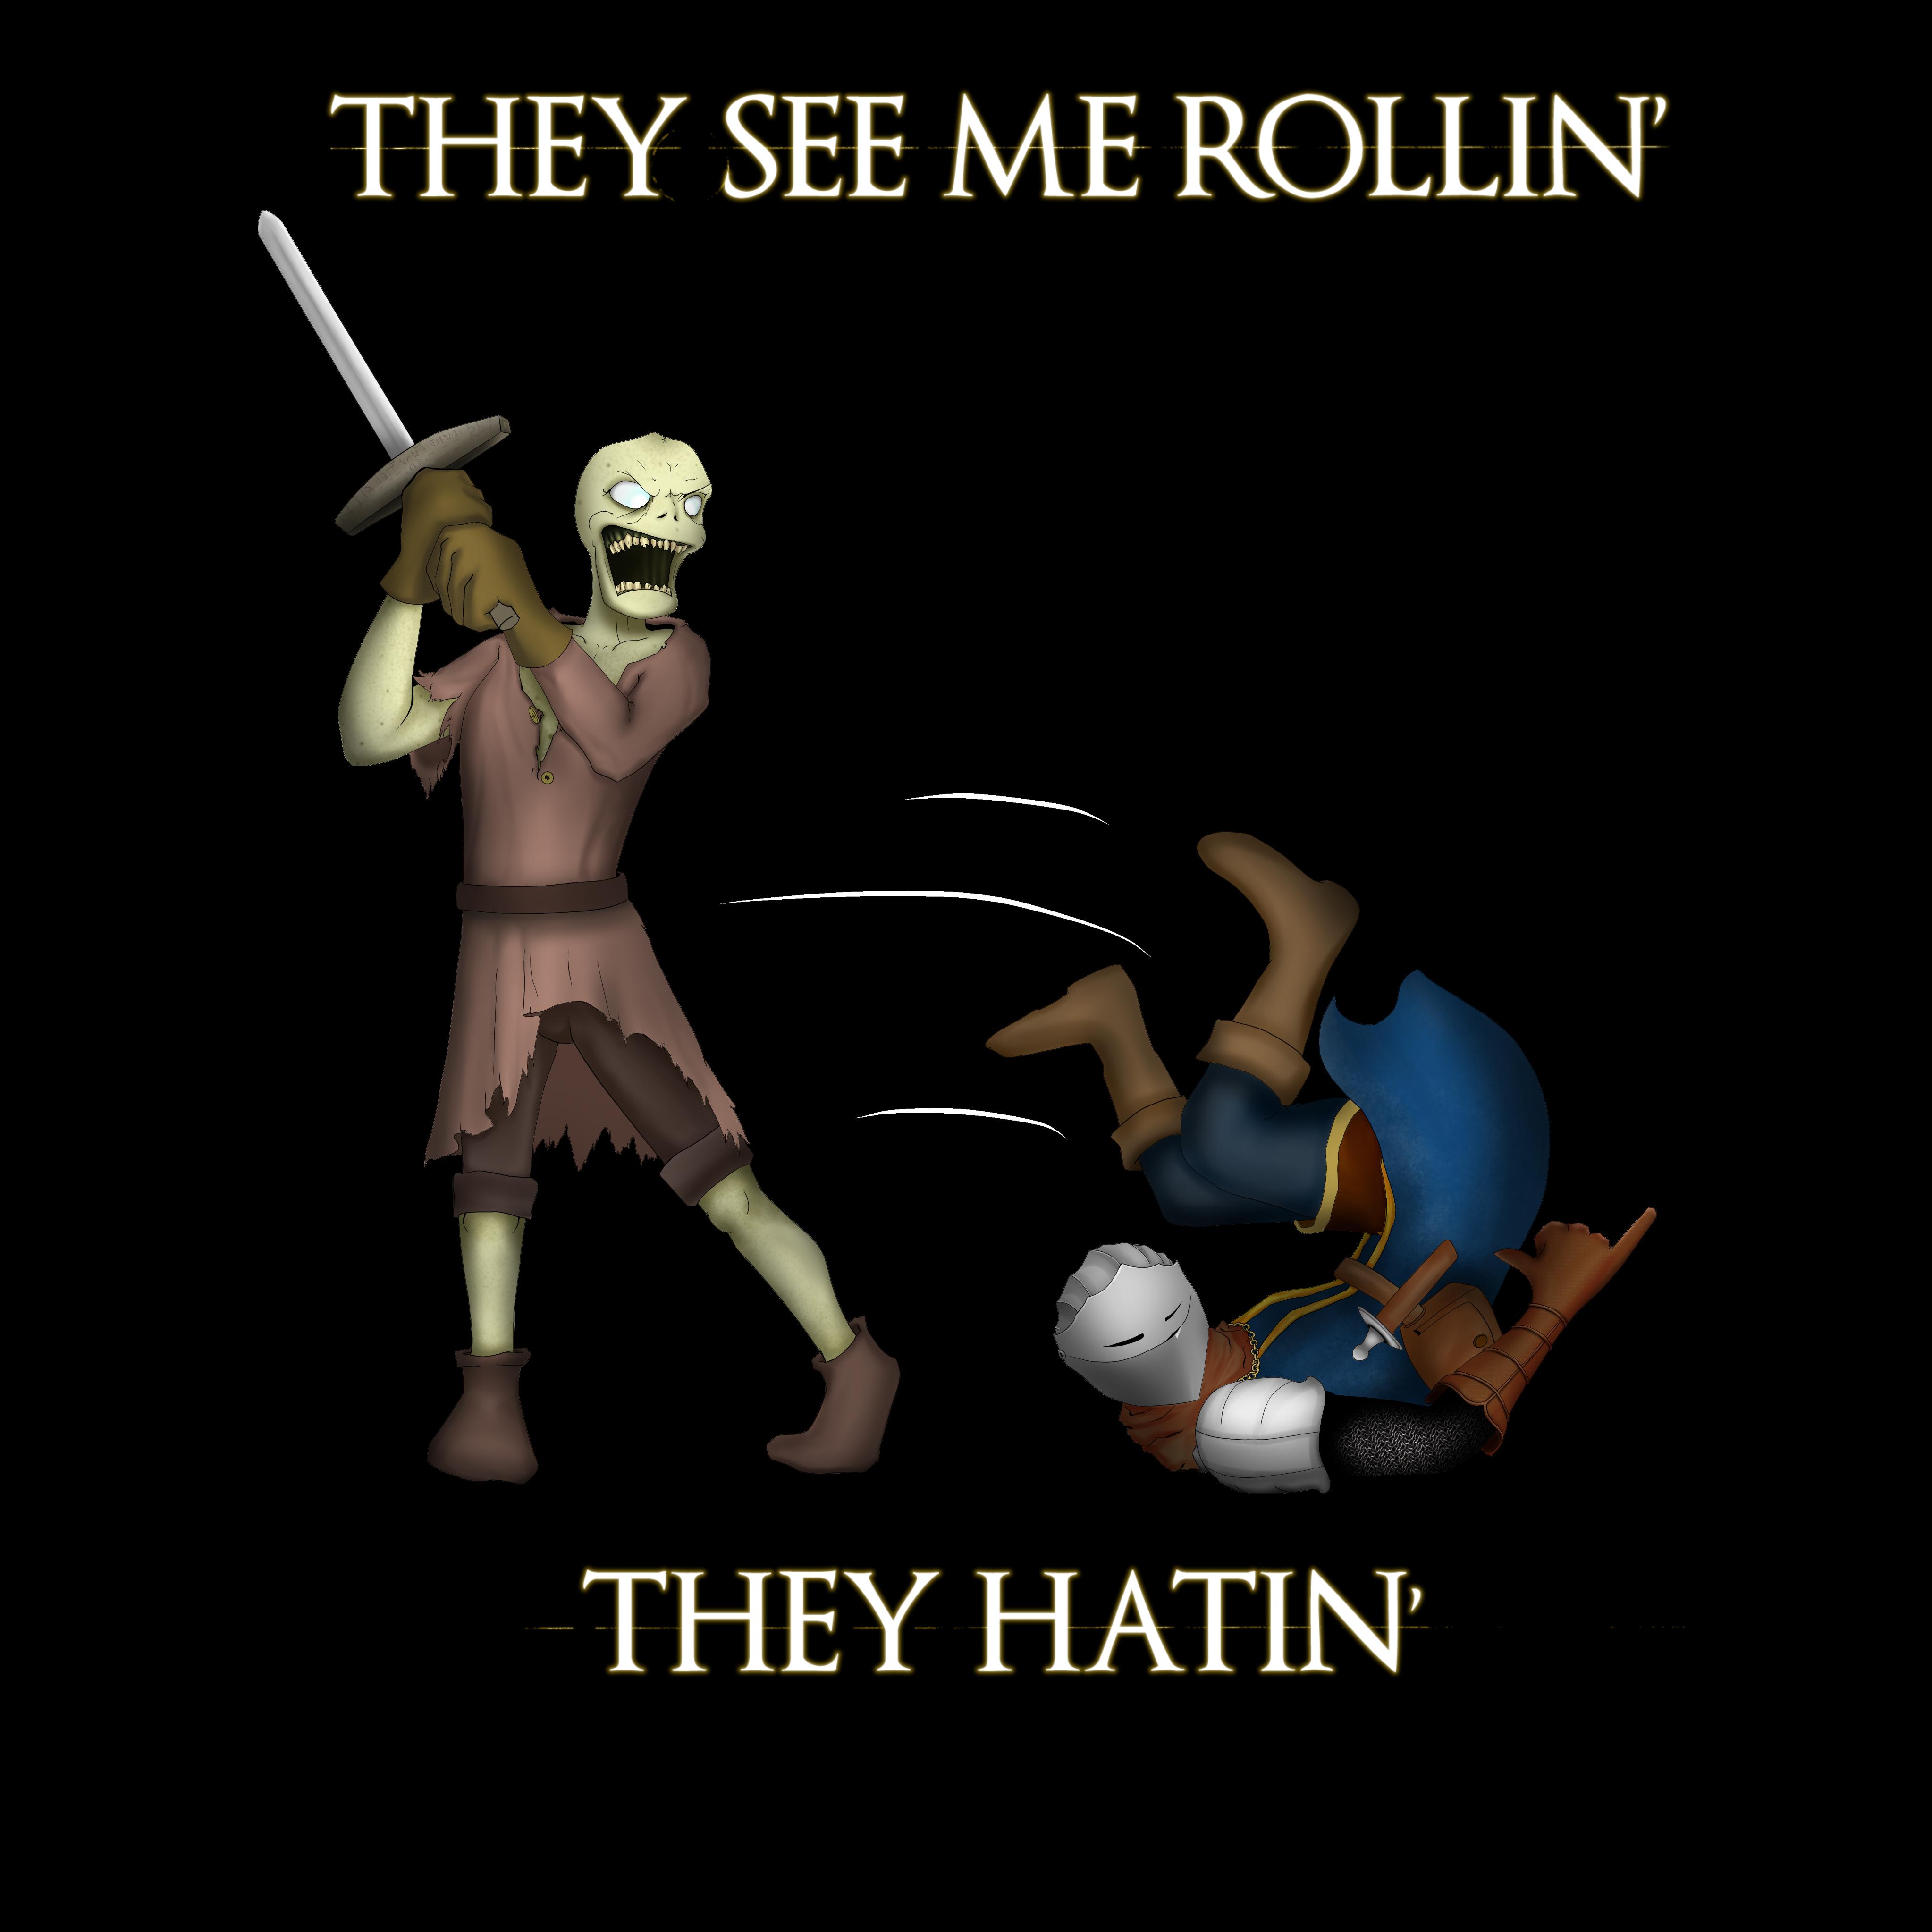 Rollin' & Hatin'